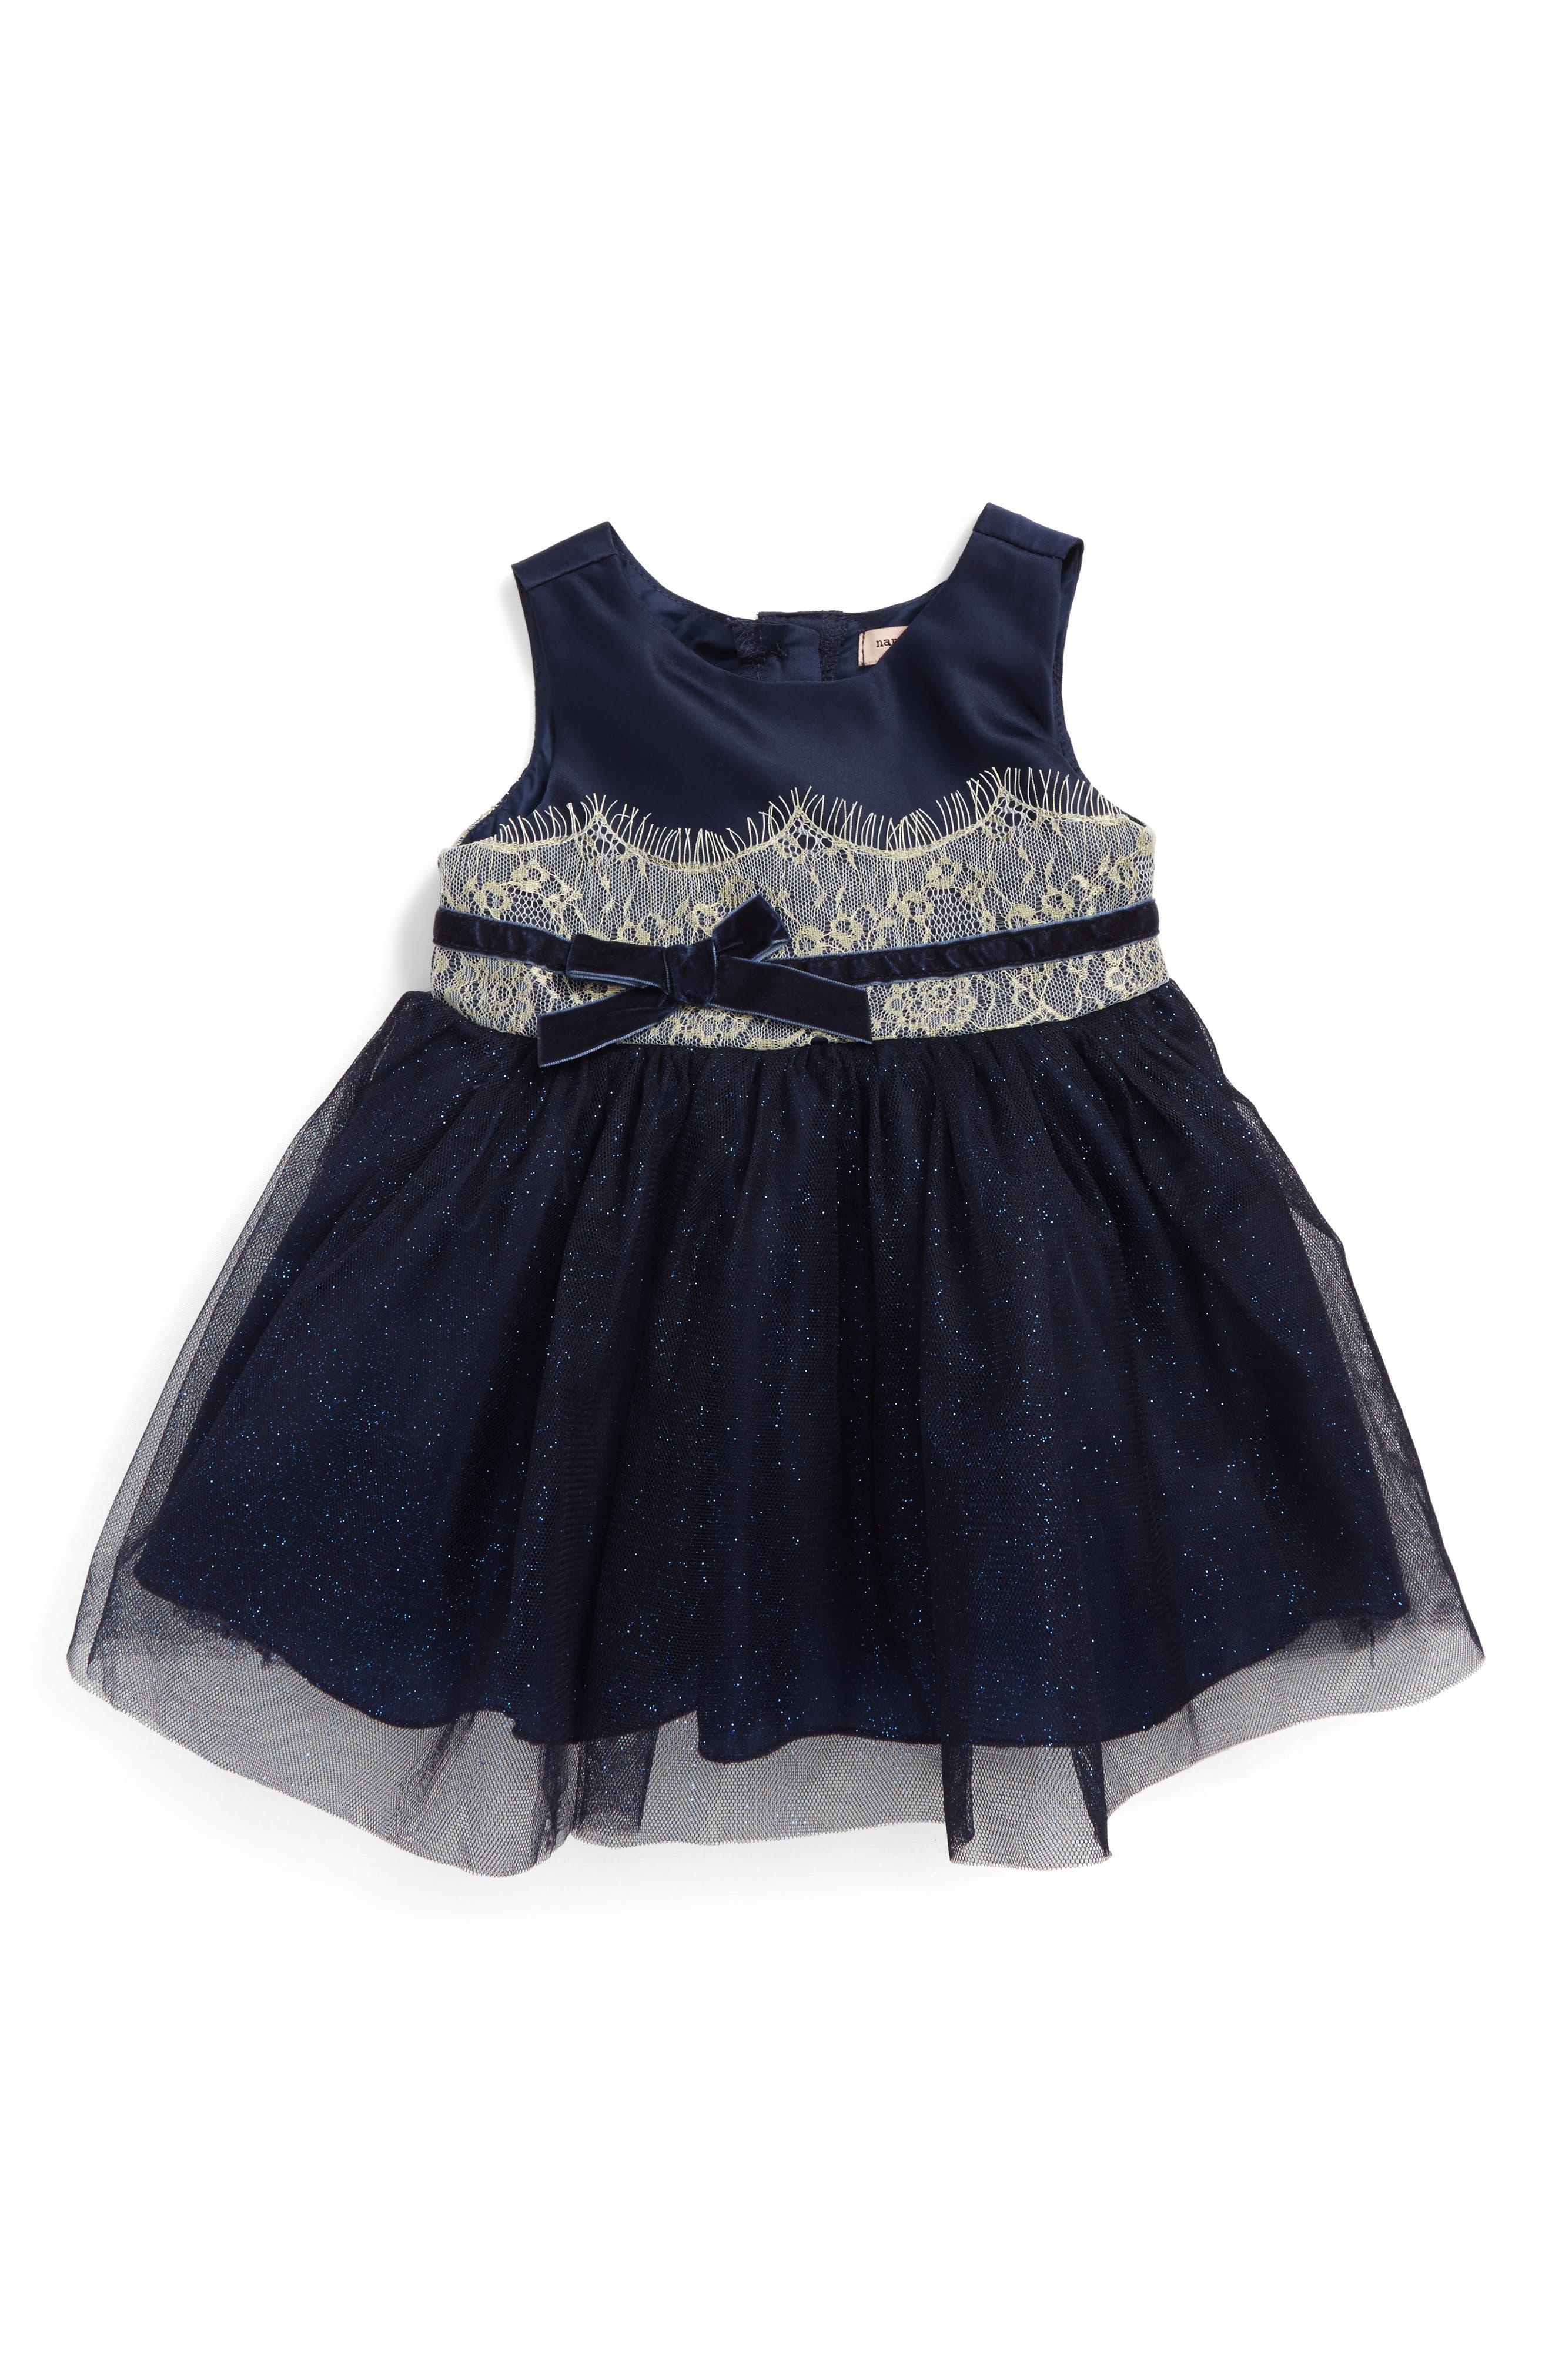 Alternate Image 1 Selected - Nanette Lepore Shimmer Lace & Tulle Dress (Baby Girls)